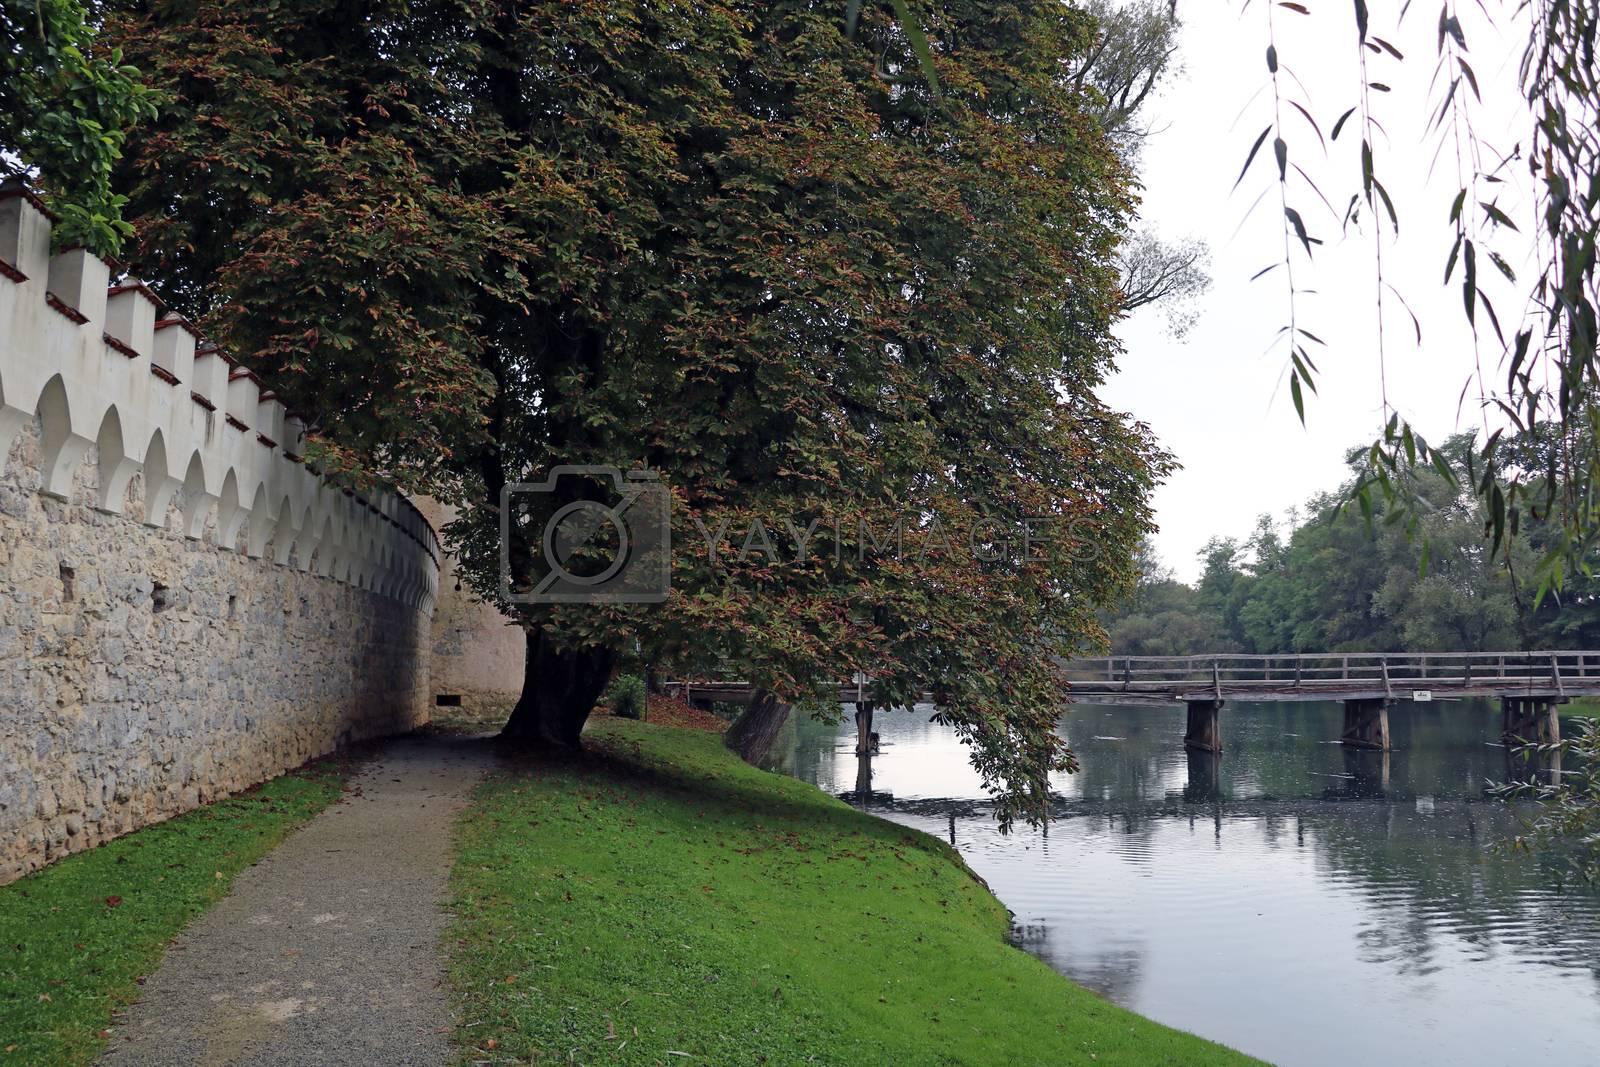 Walking path along the river or lake